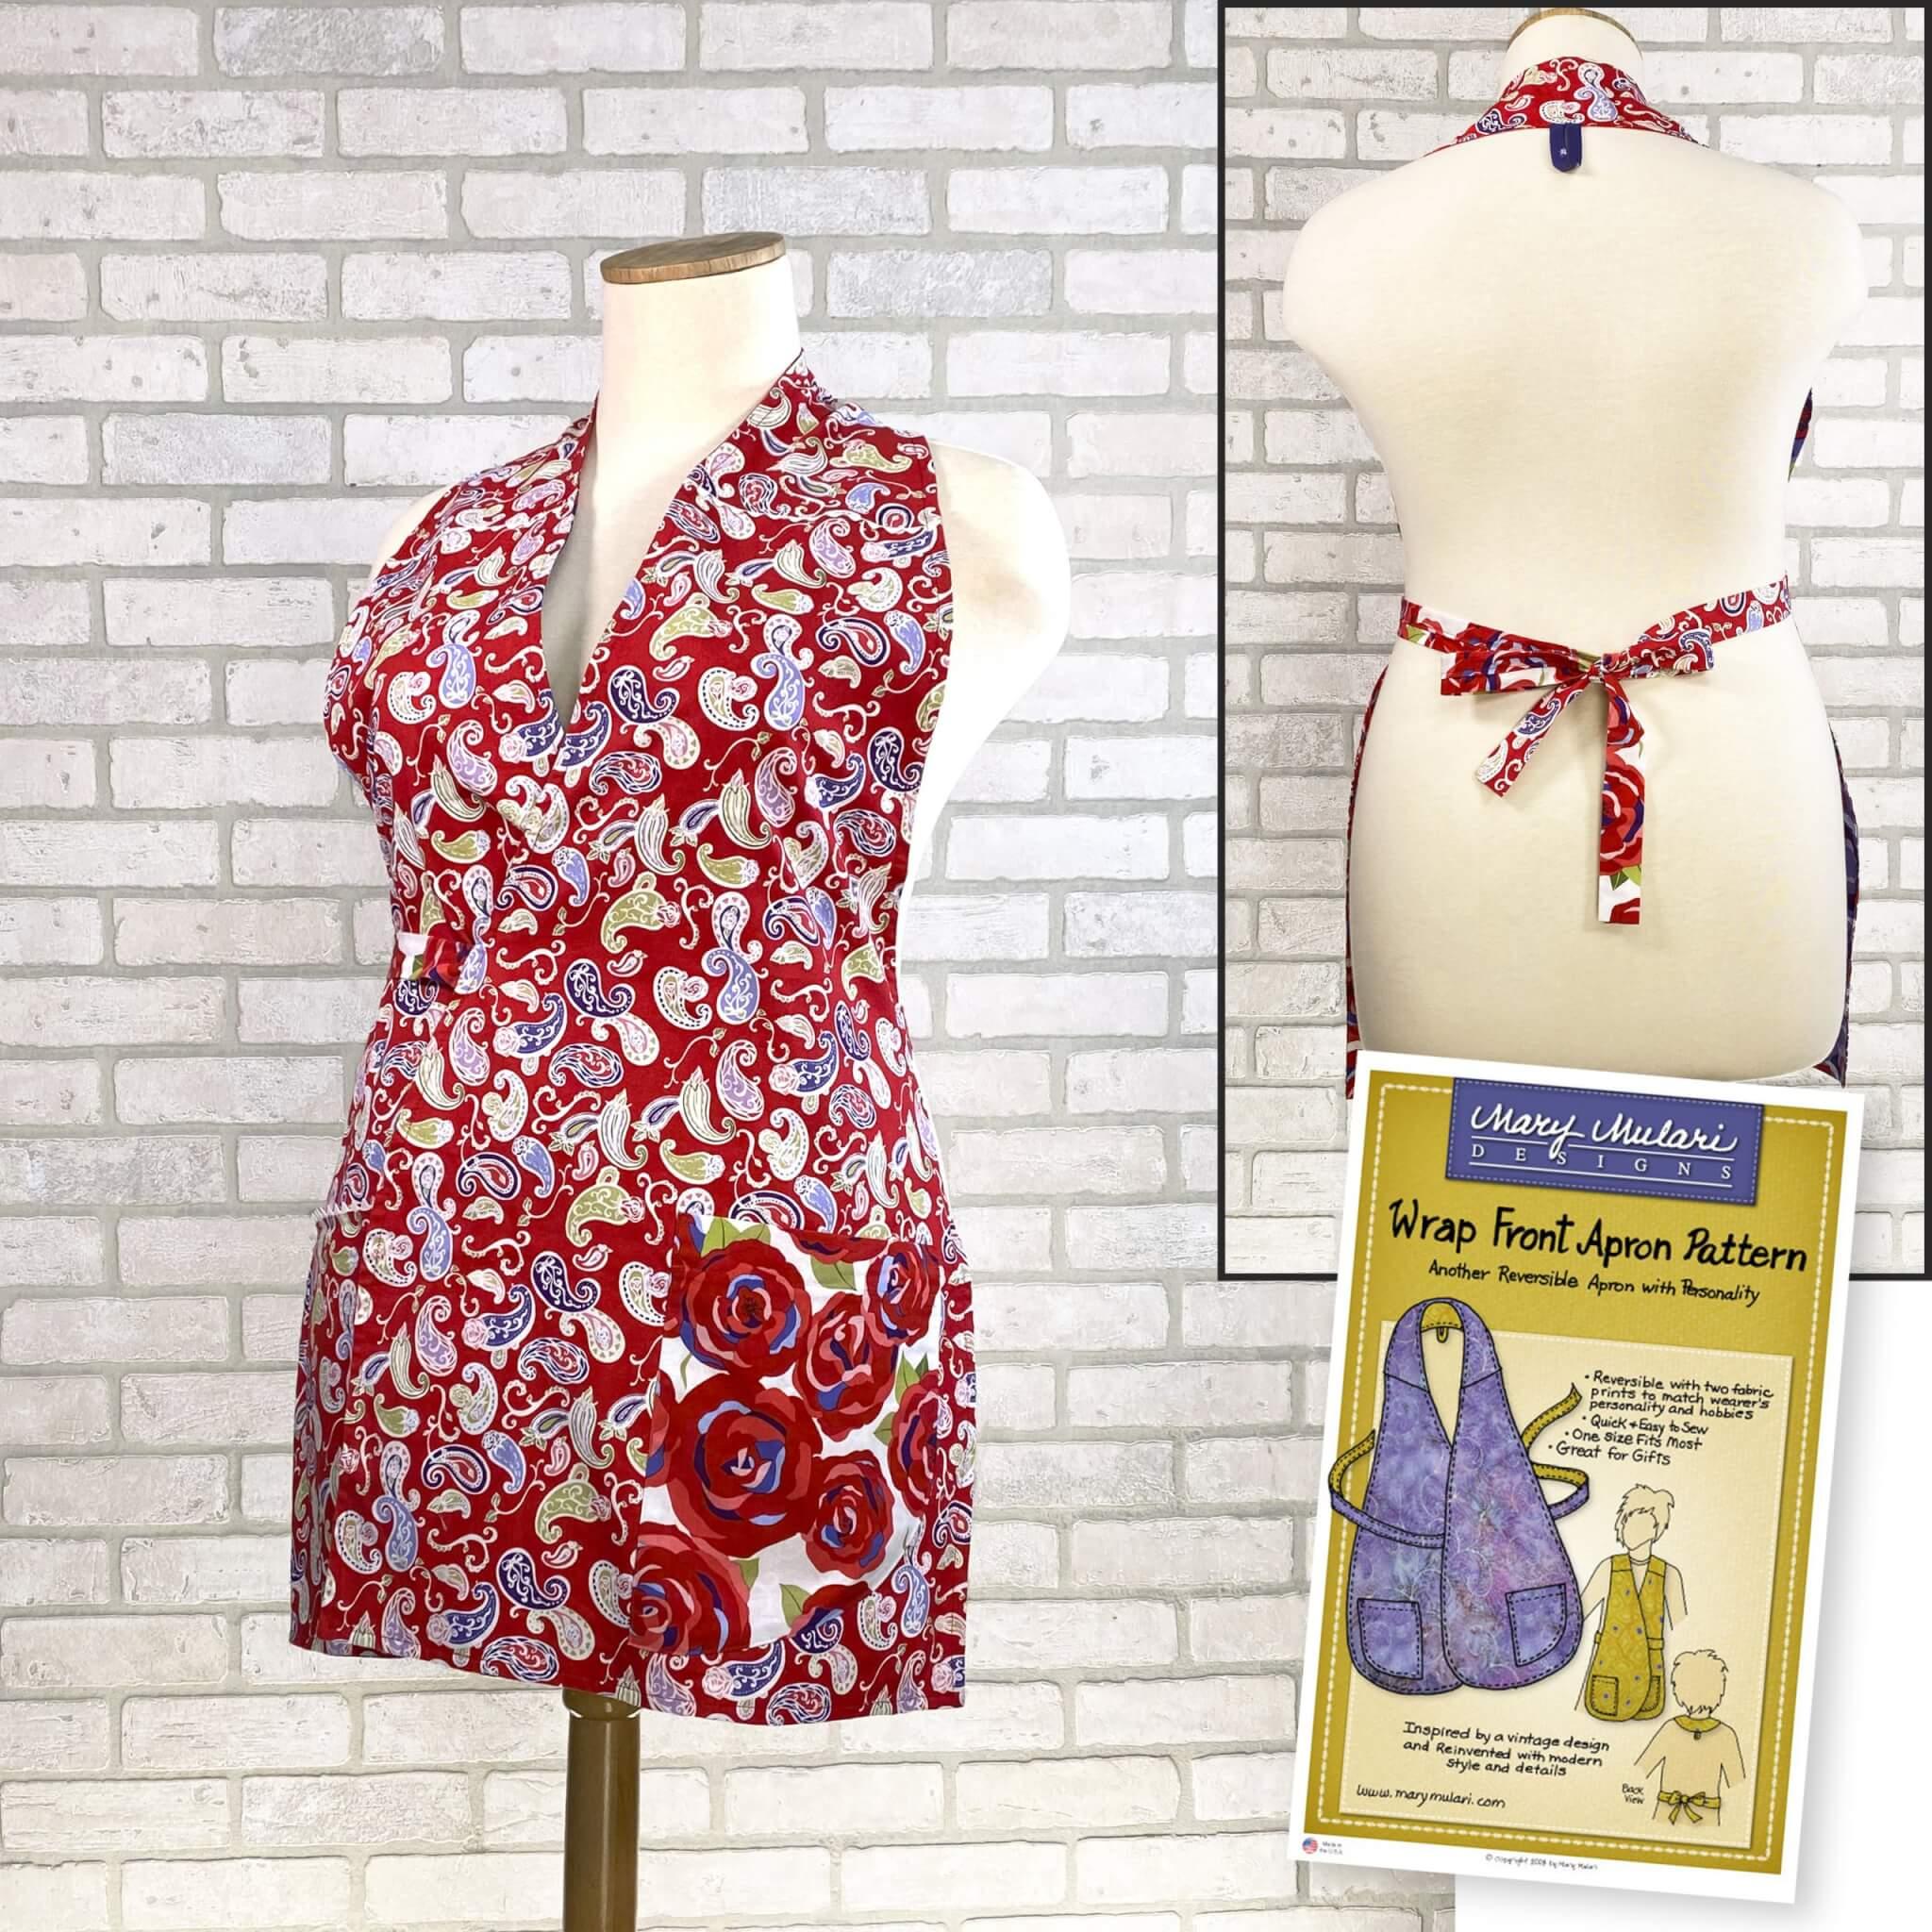 Mary Mulari's Wrap Front Apron Pattern Available at Nancy Zieman Productions at ShopNZP.com